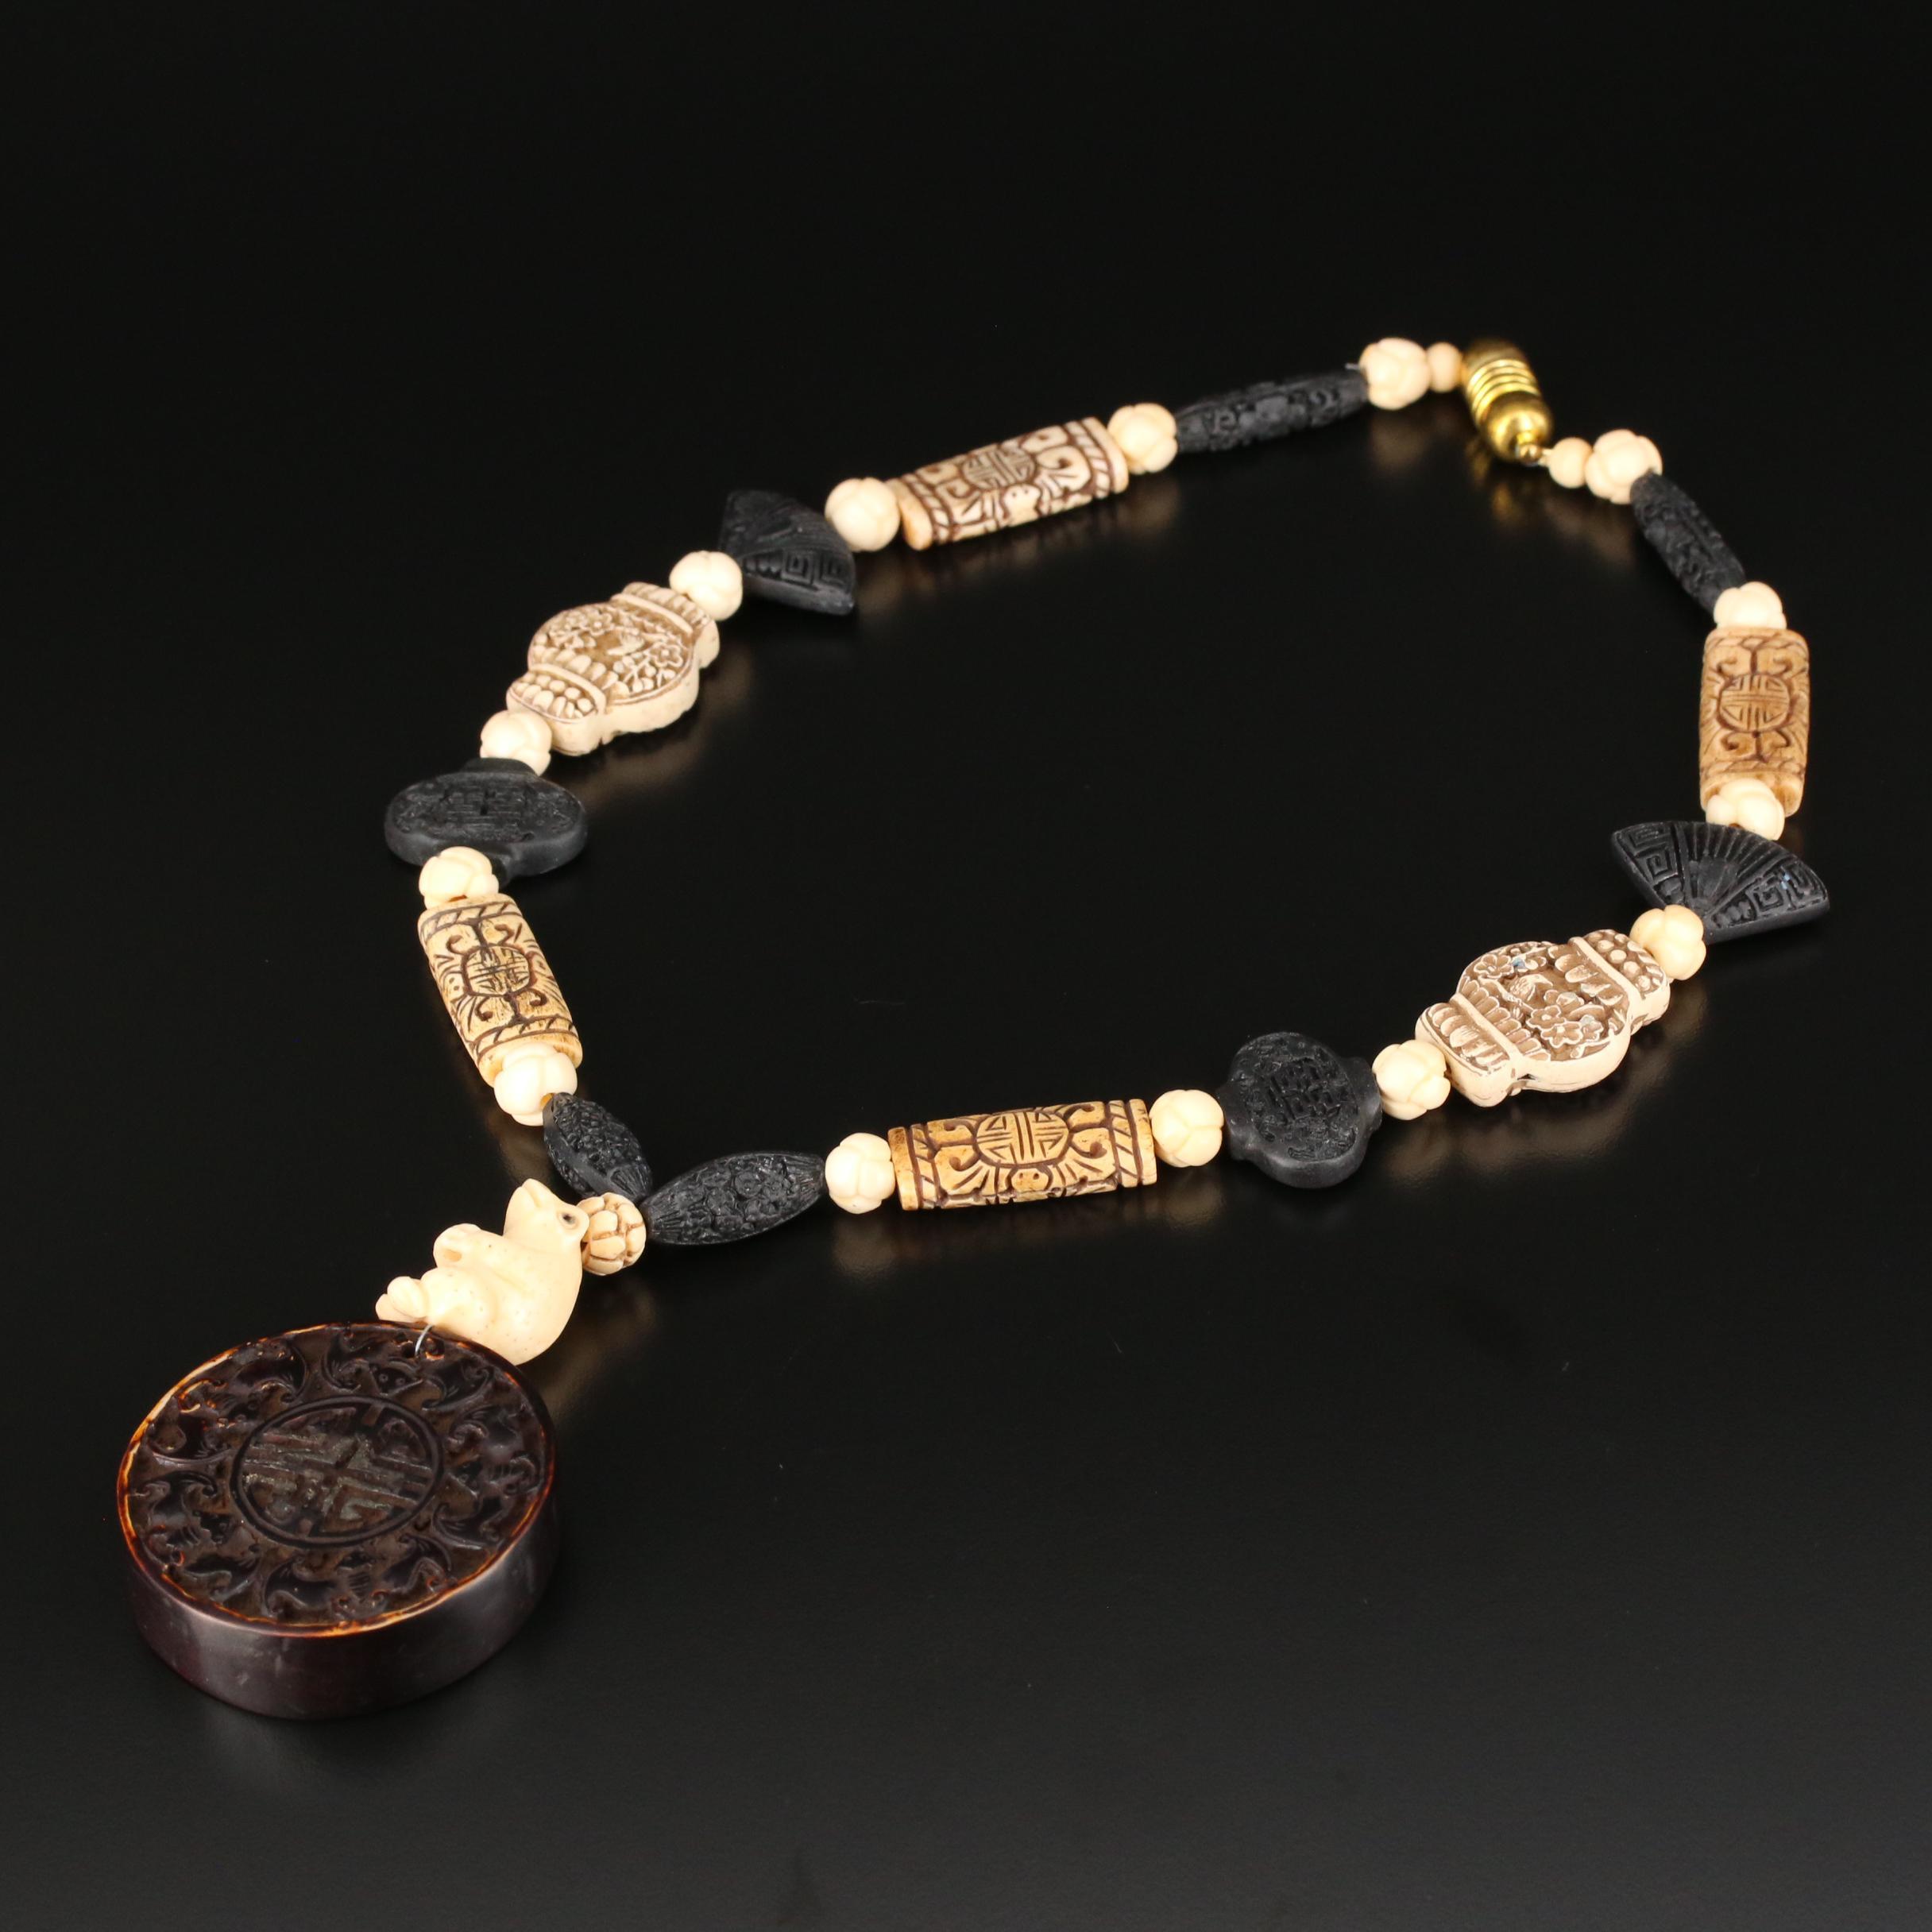 Asian bone pendant necklace.